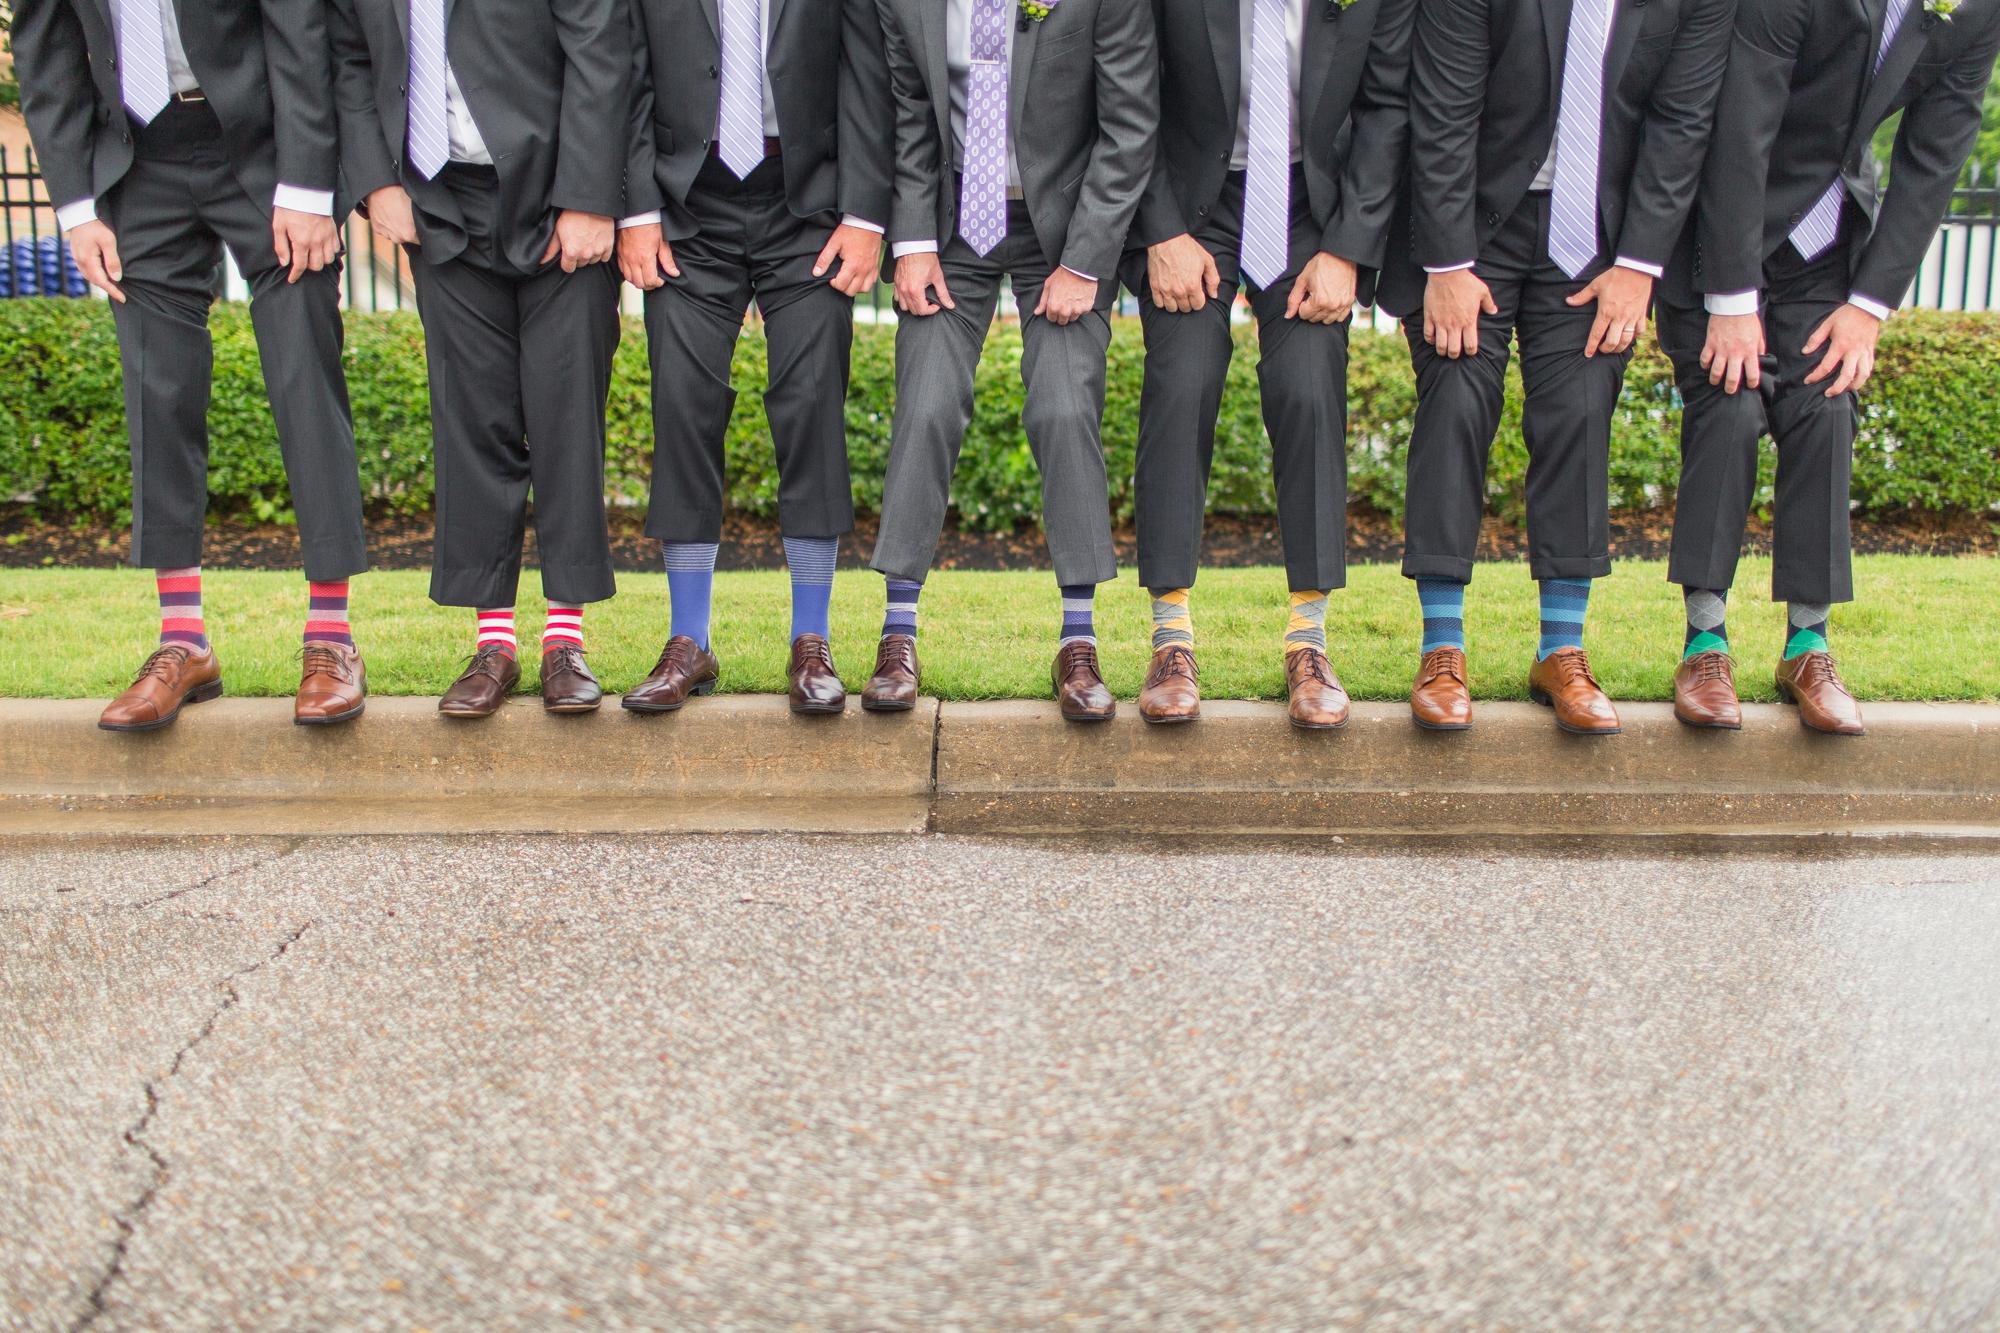 gaywedding-145.jpg